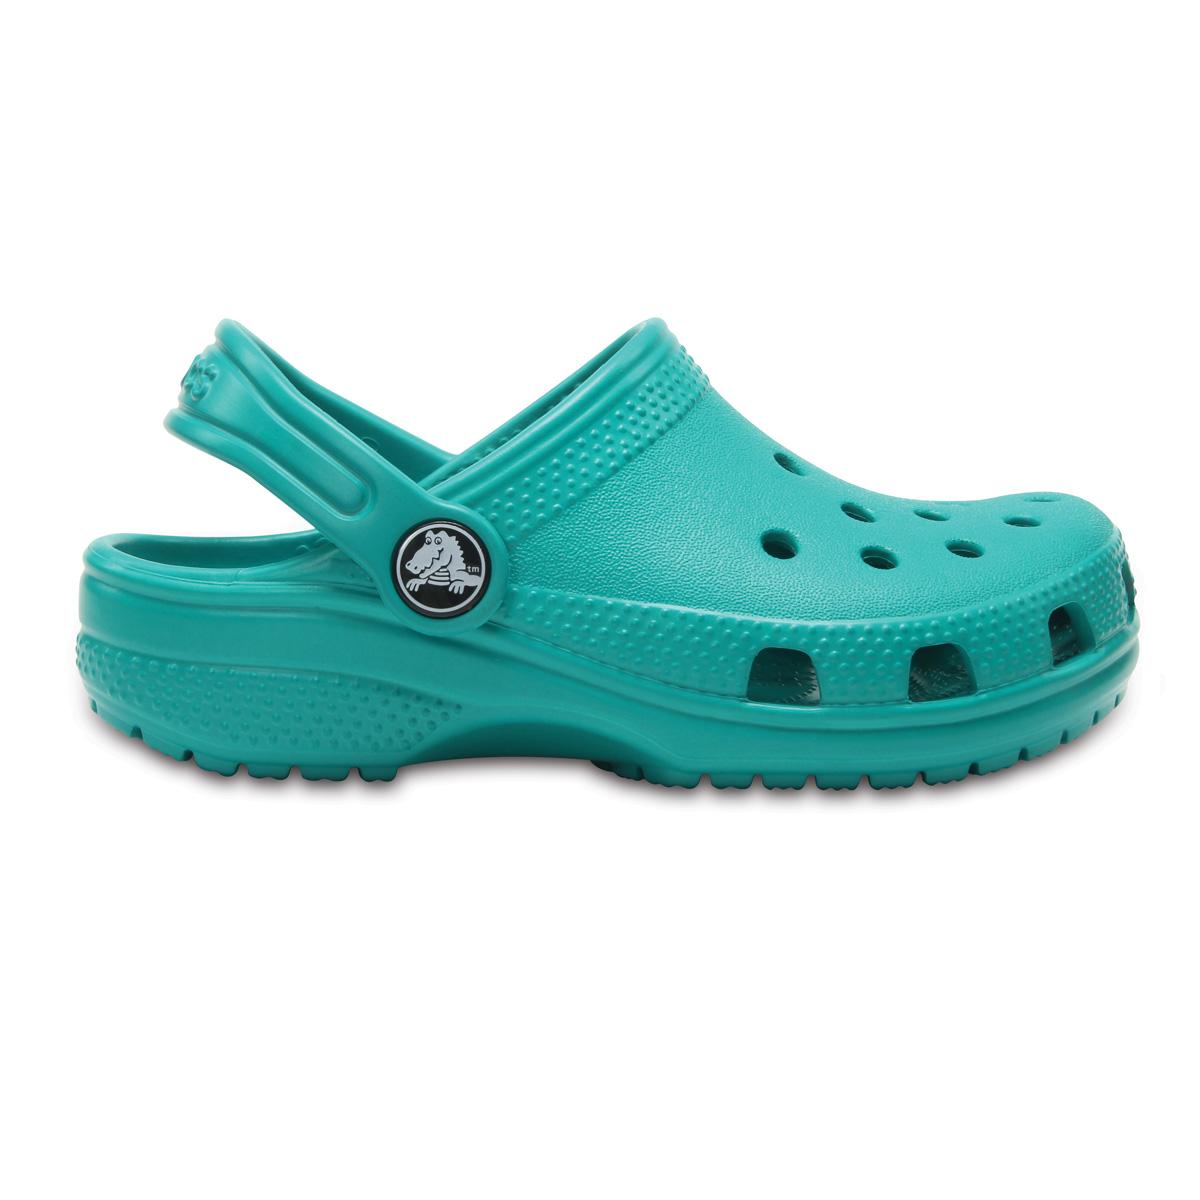 Crocs Classic Clog K - Tropikal Deniz mavisi